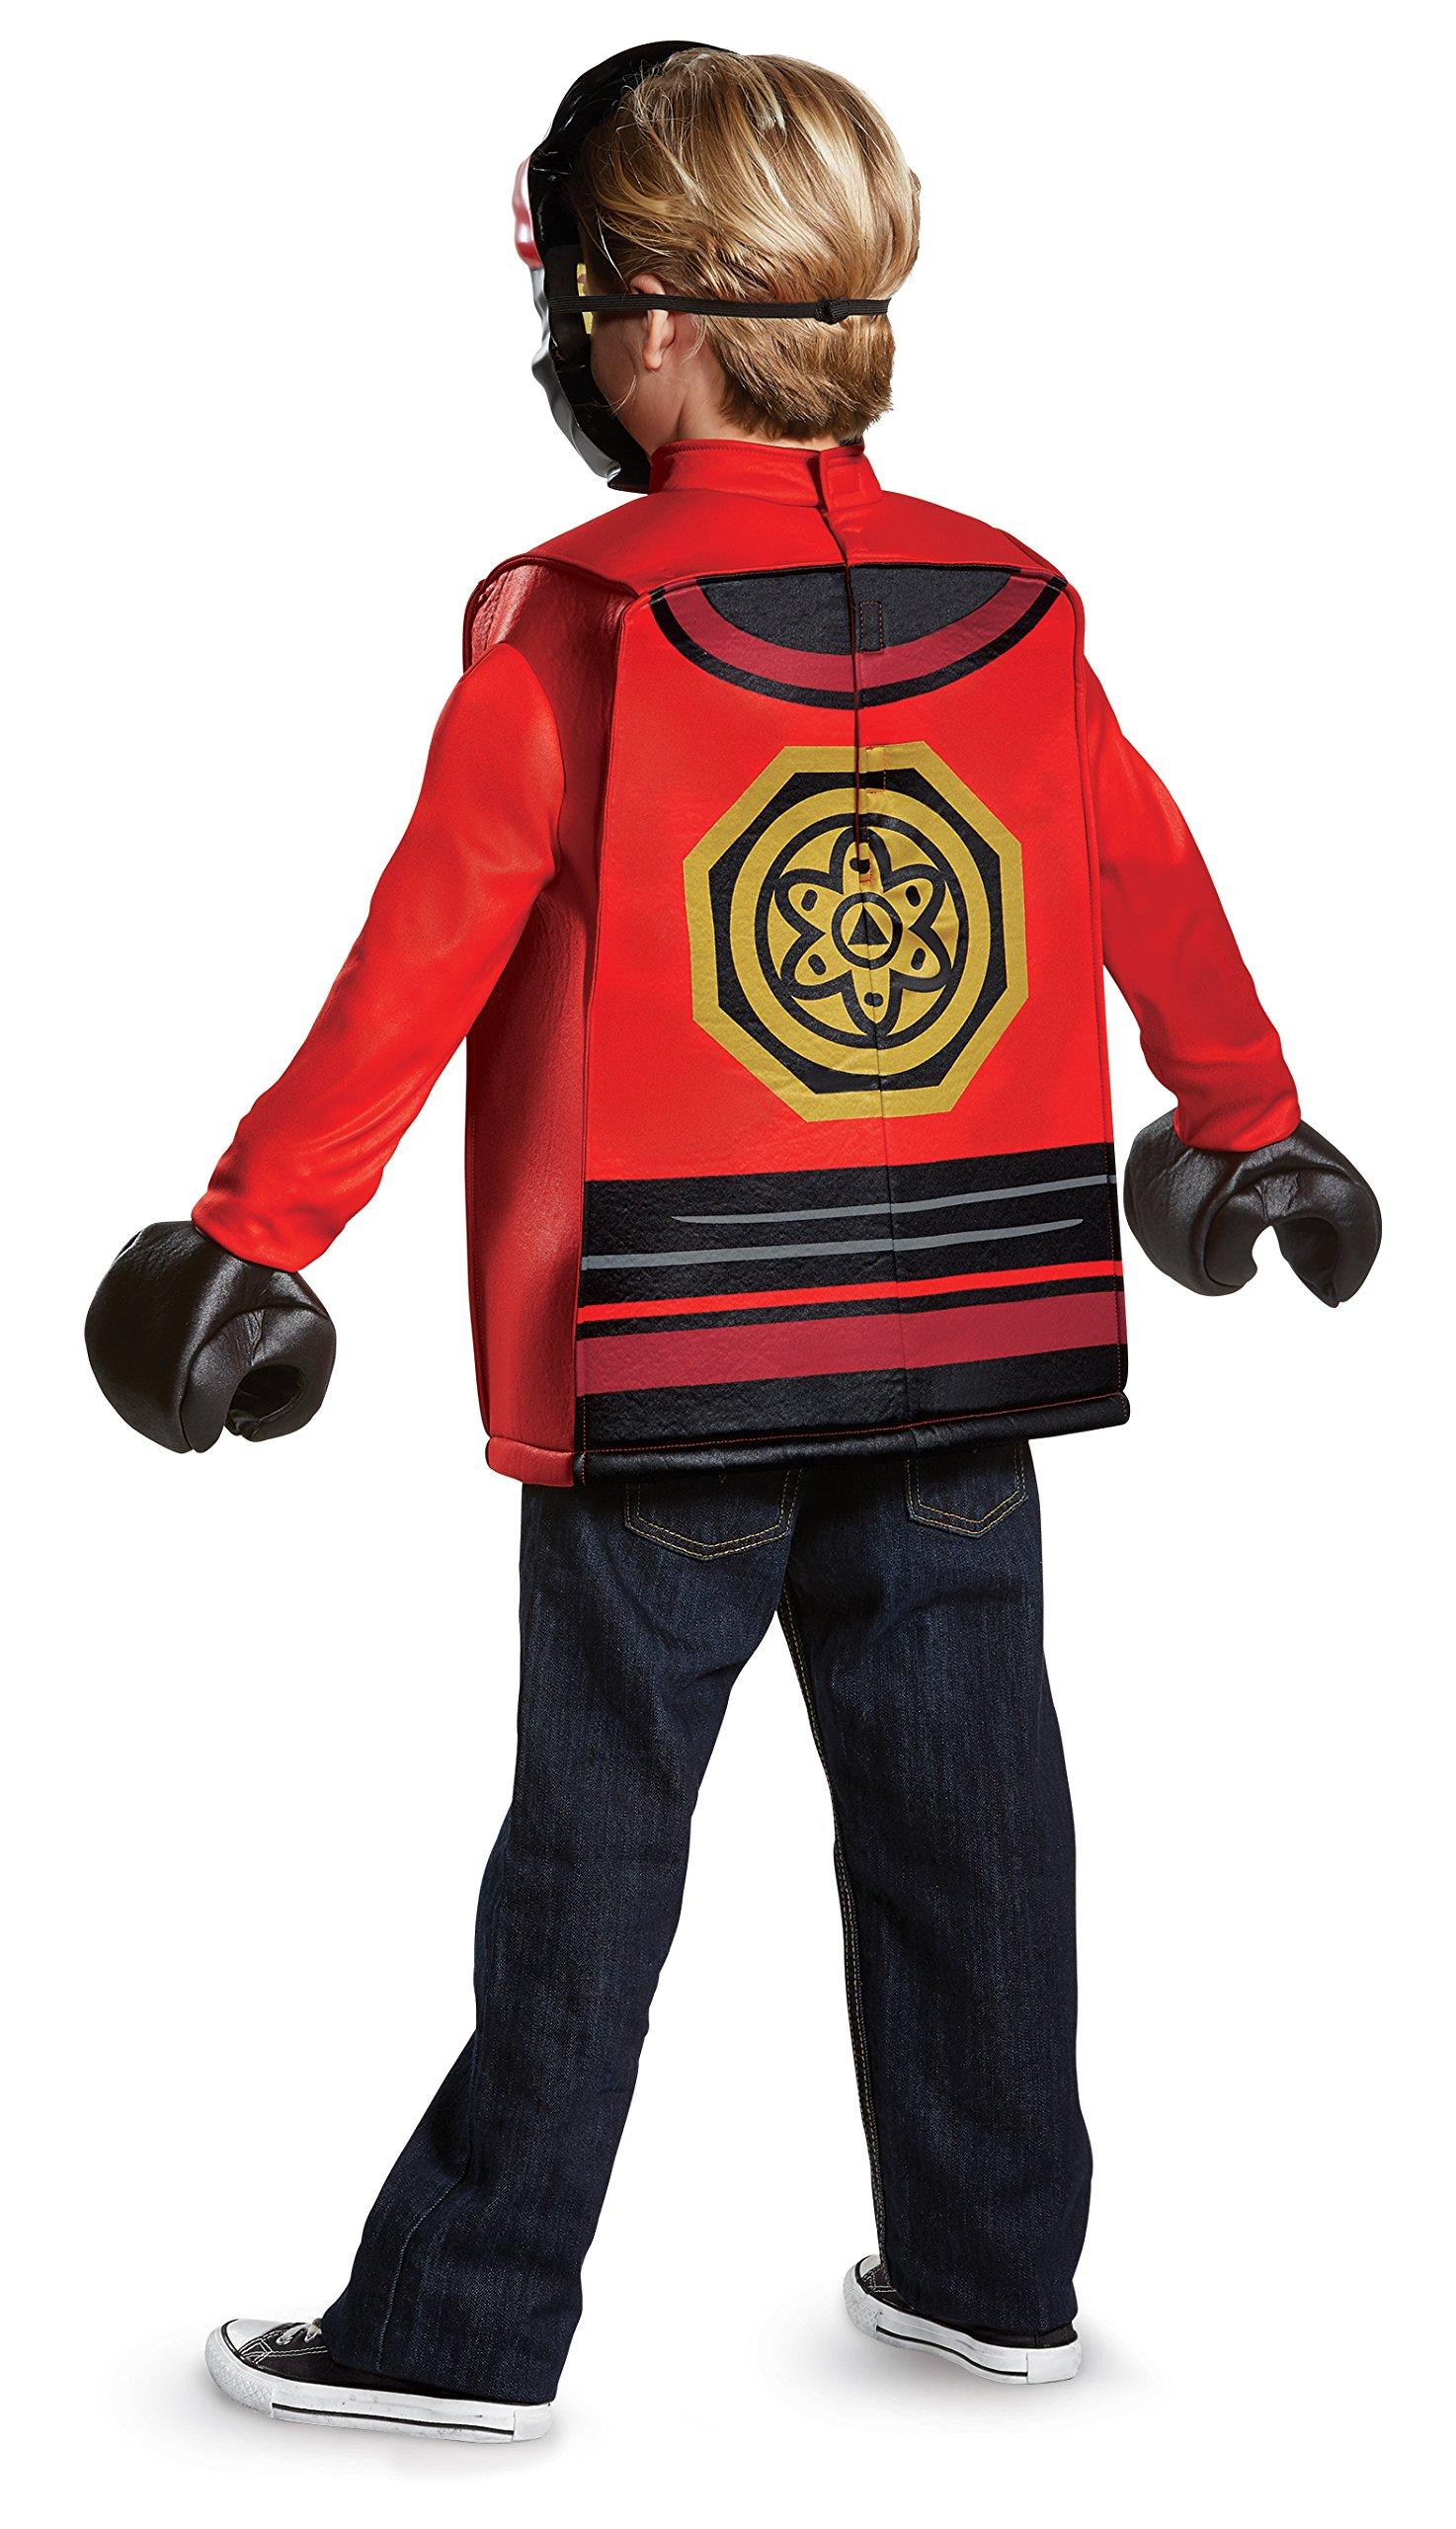 Lego Ninjago Kai 23480K Movie Classic costume, 7 - 8anni 2 spesavip